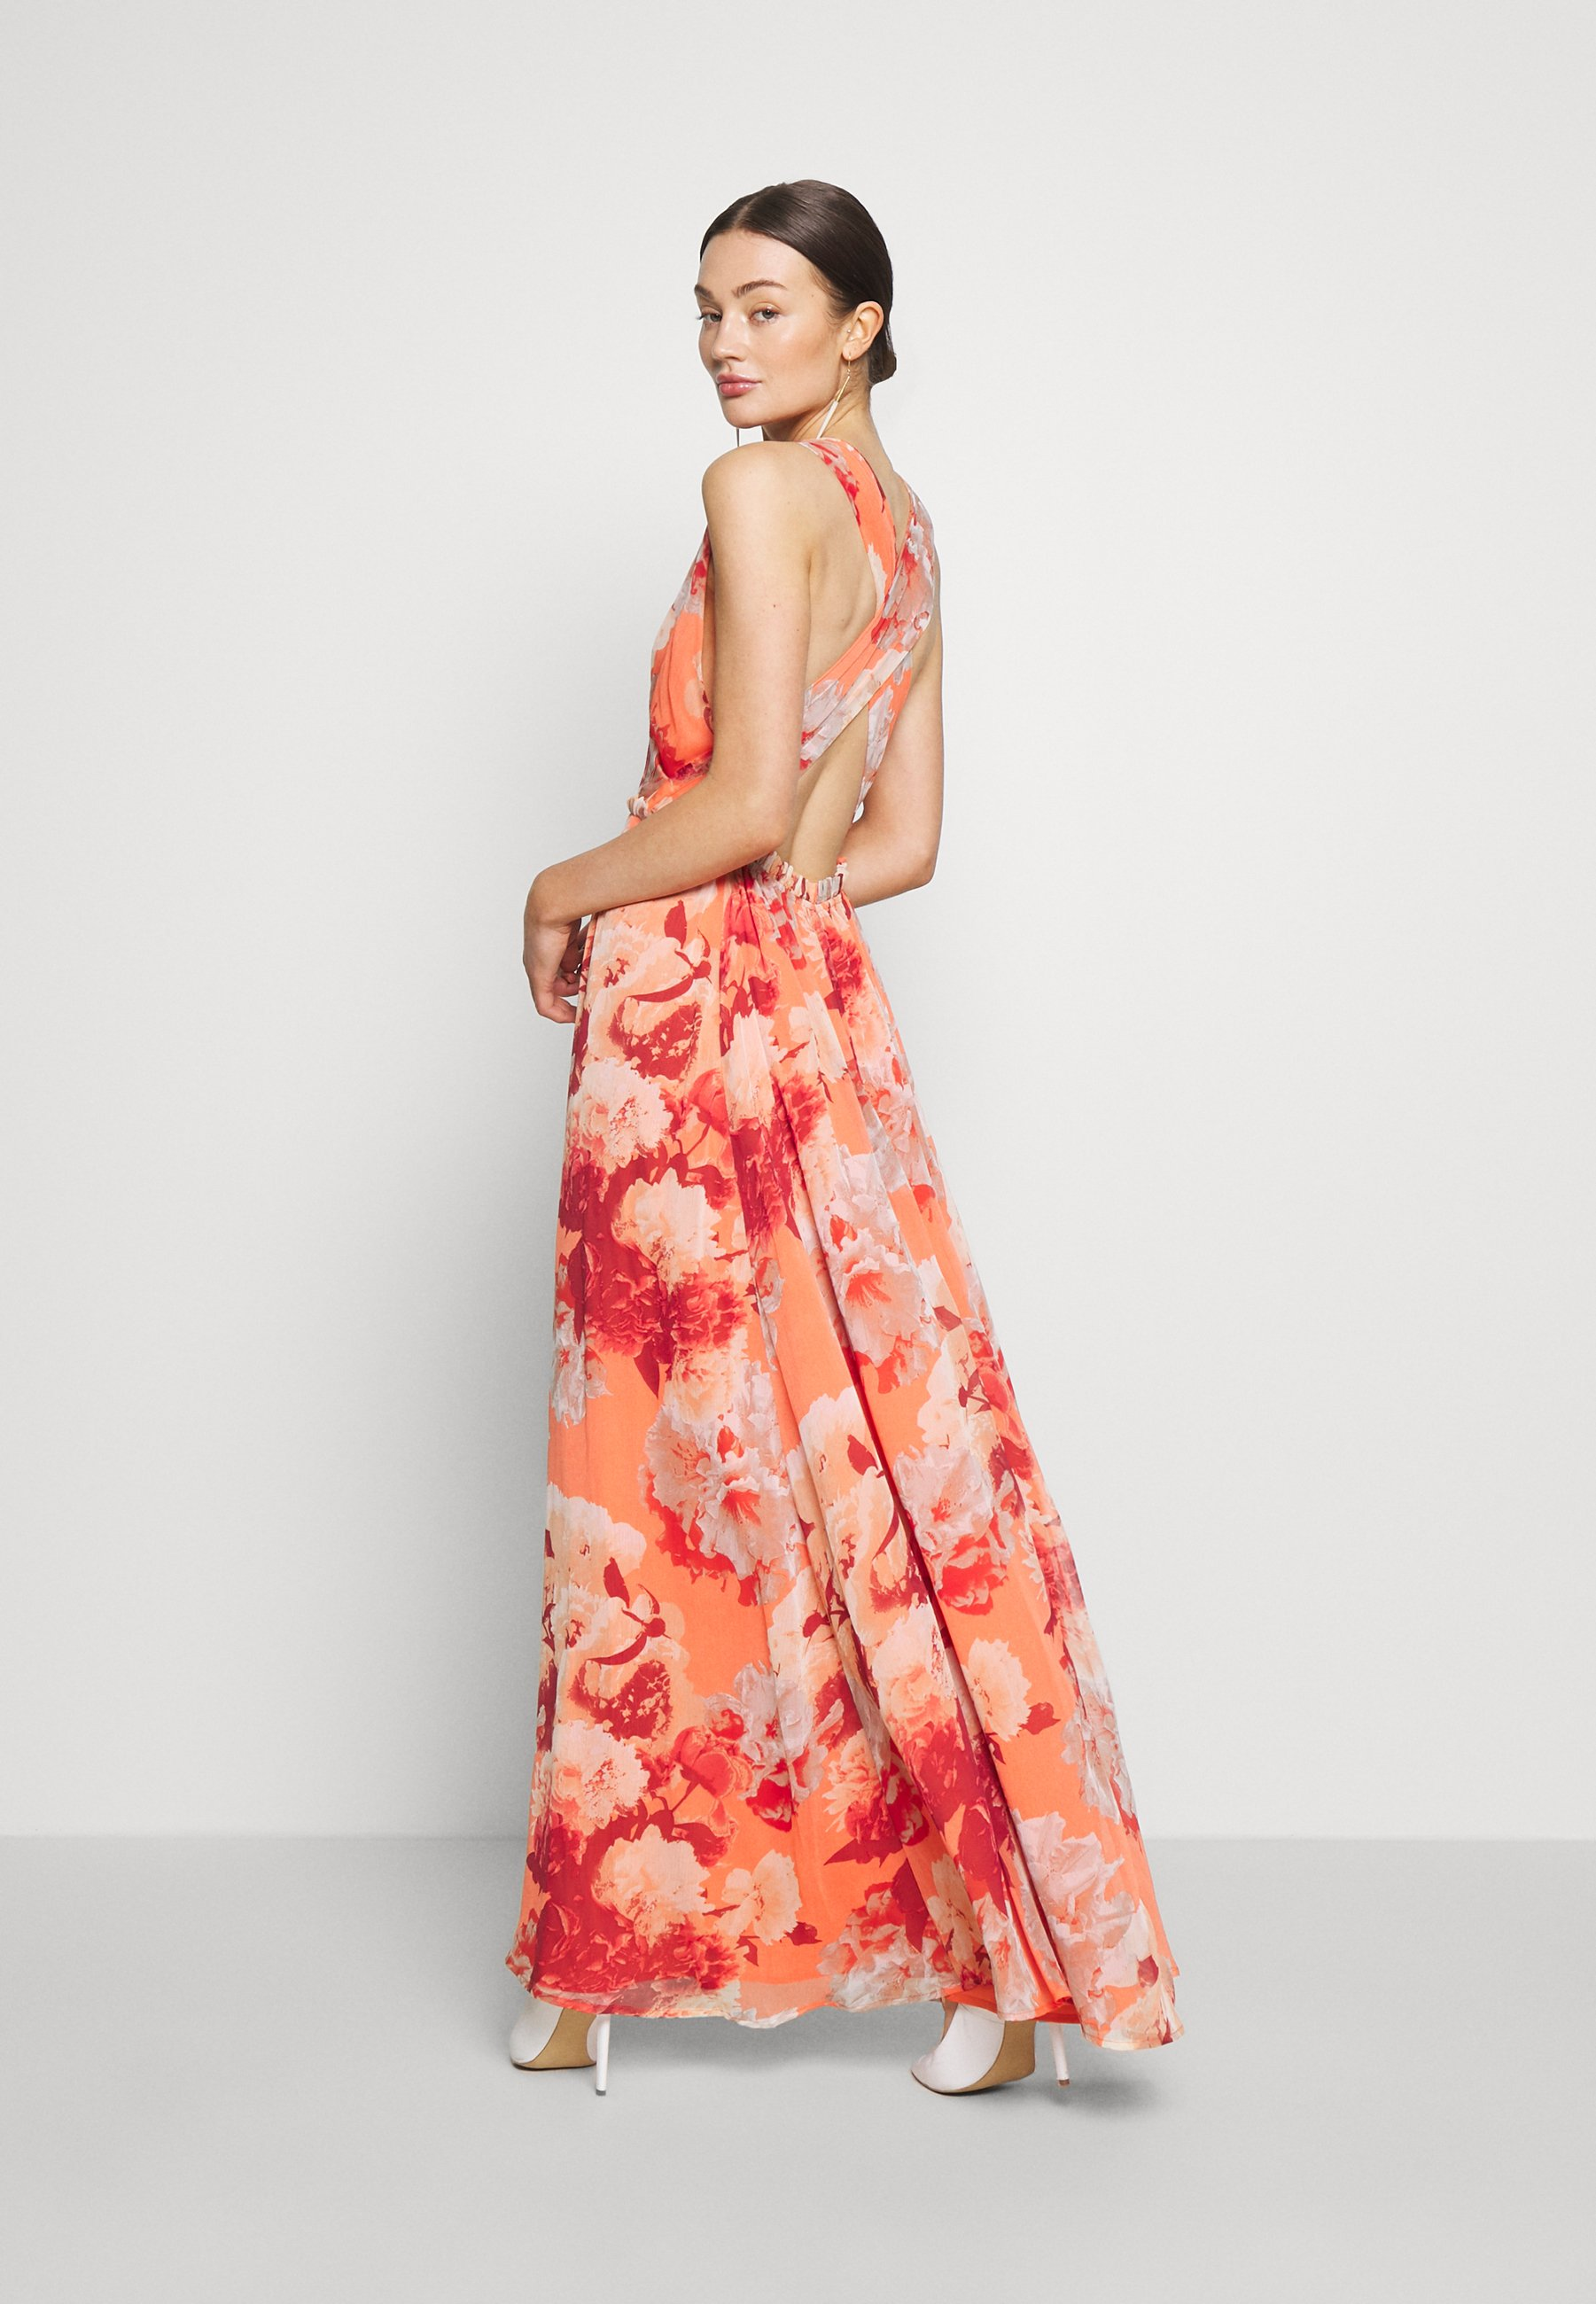 YAS YASROSETTA MAXI DRESS SHOW - Robe longue - nasturtium - Robes femme PMn7X